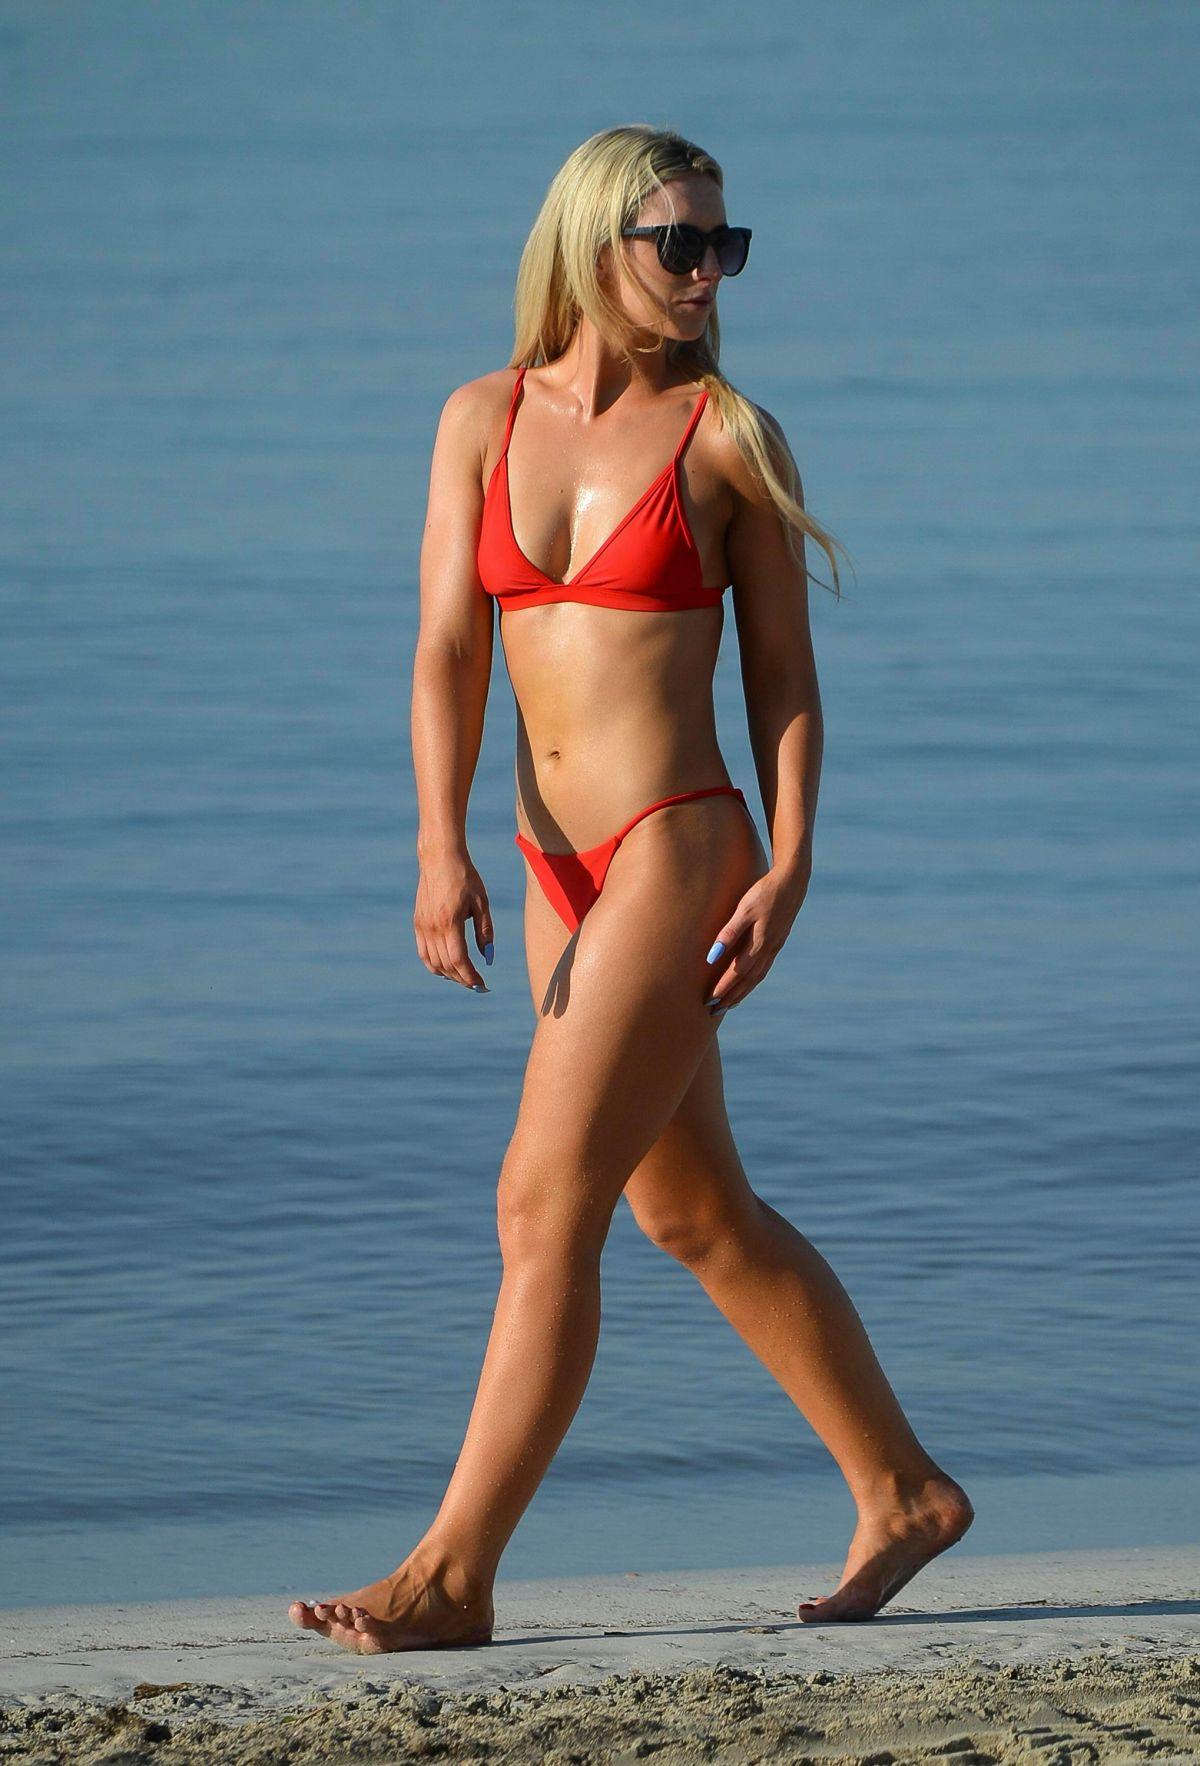 Bikini Michaella McCollum nudes (81 foto and video), Topless, Leaked, Boobs, lingerie 2020